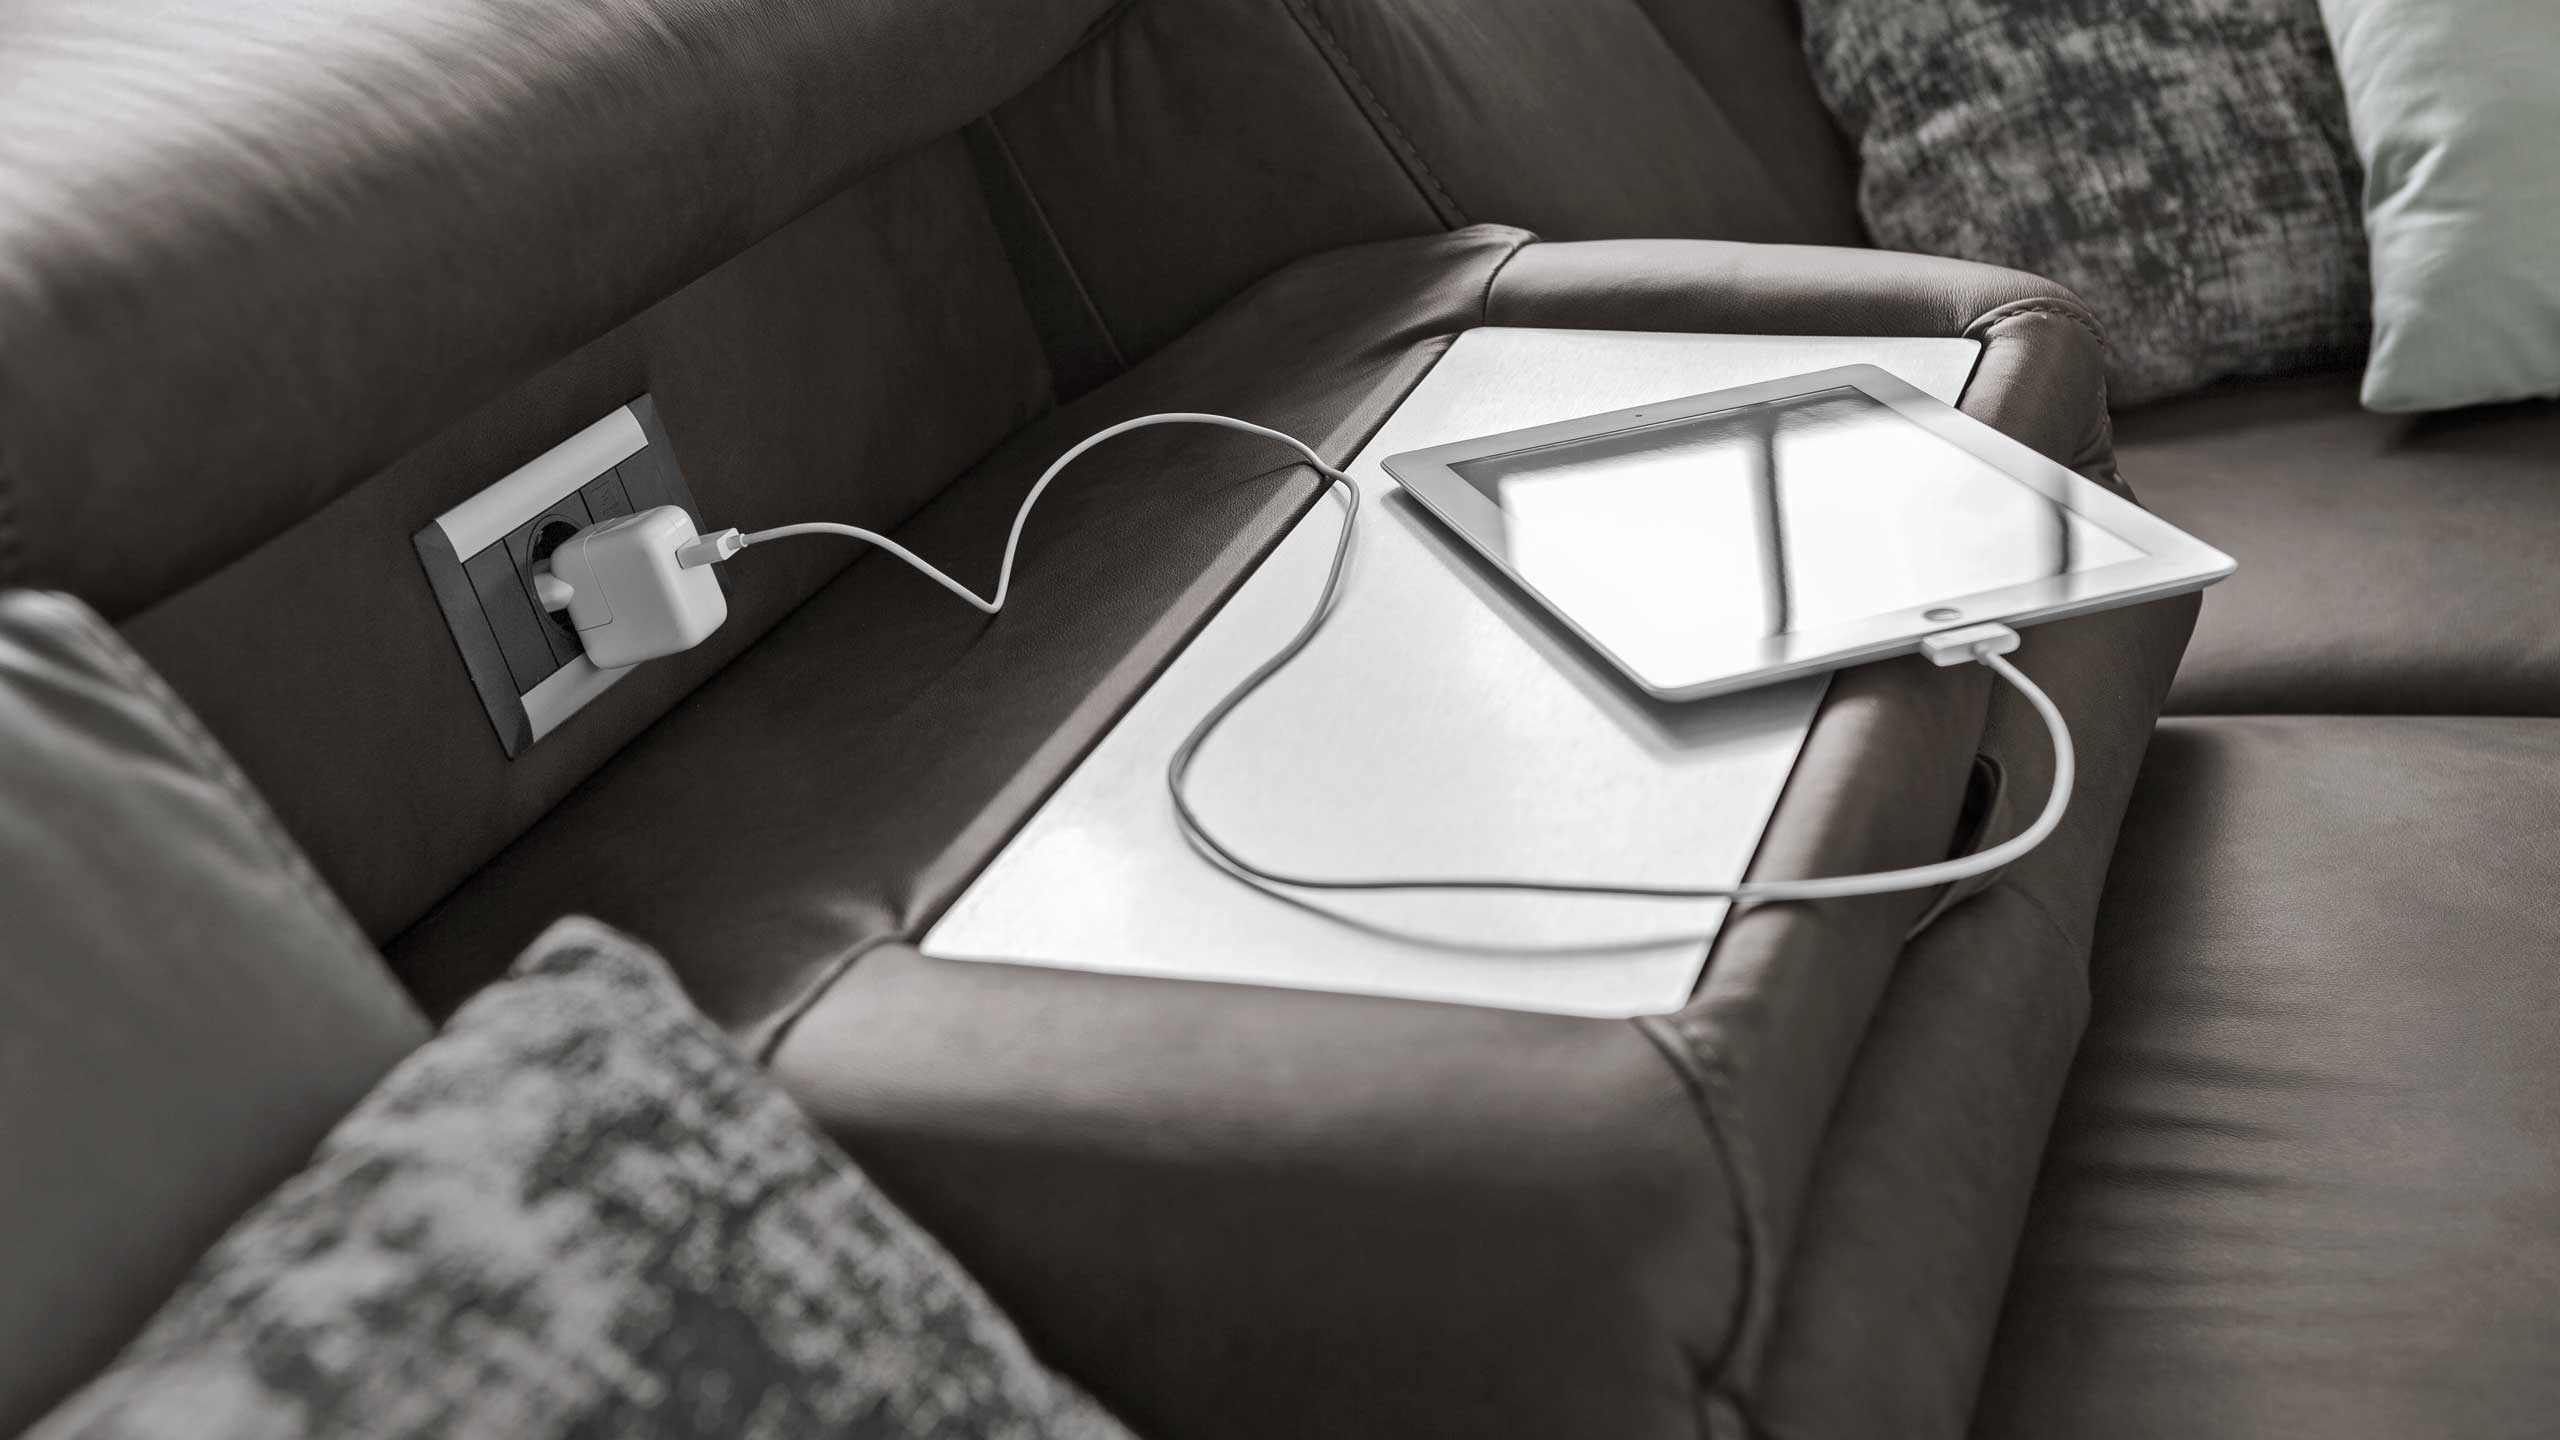 Interliving Sofa Serie 4305 mit Funktionsablage